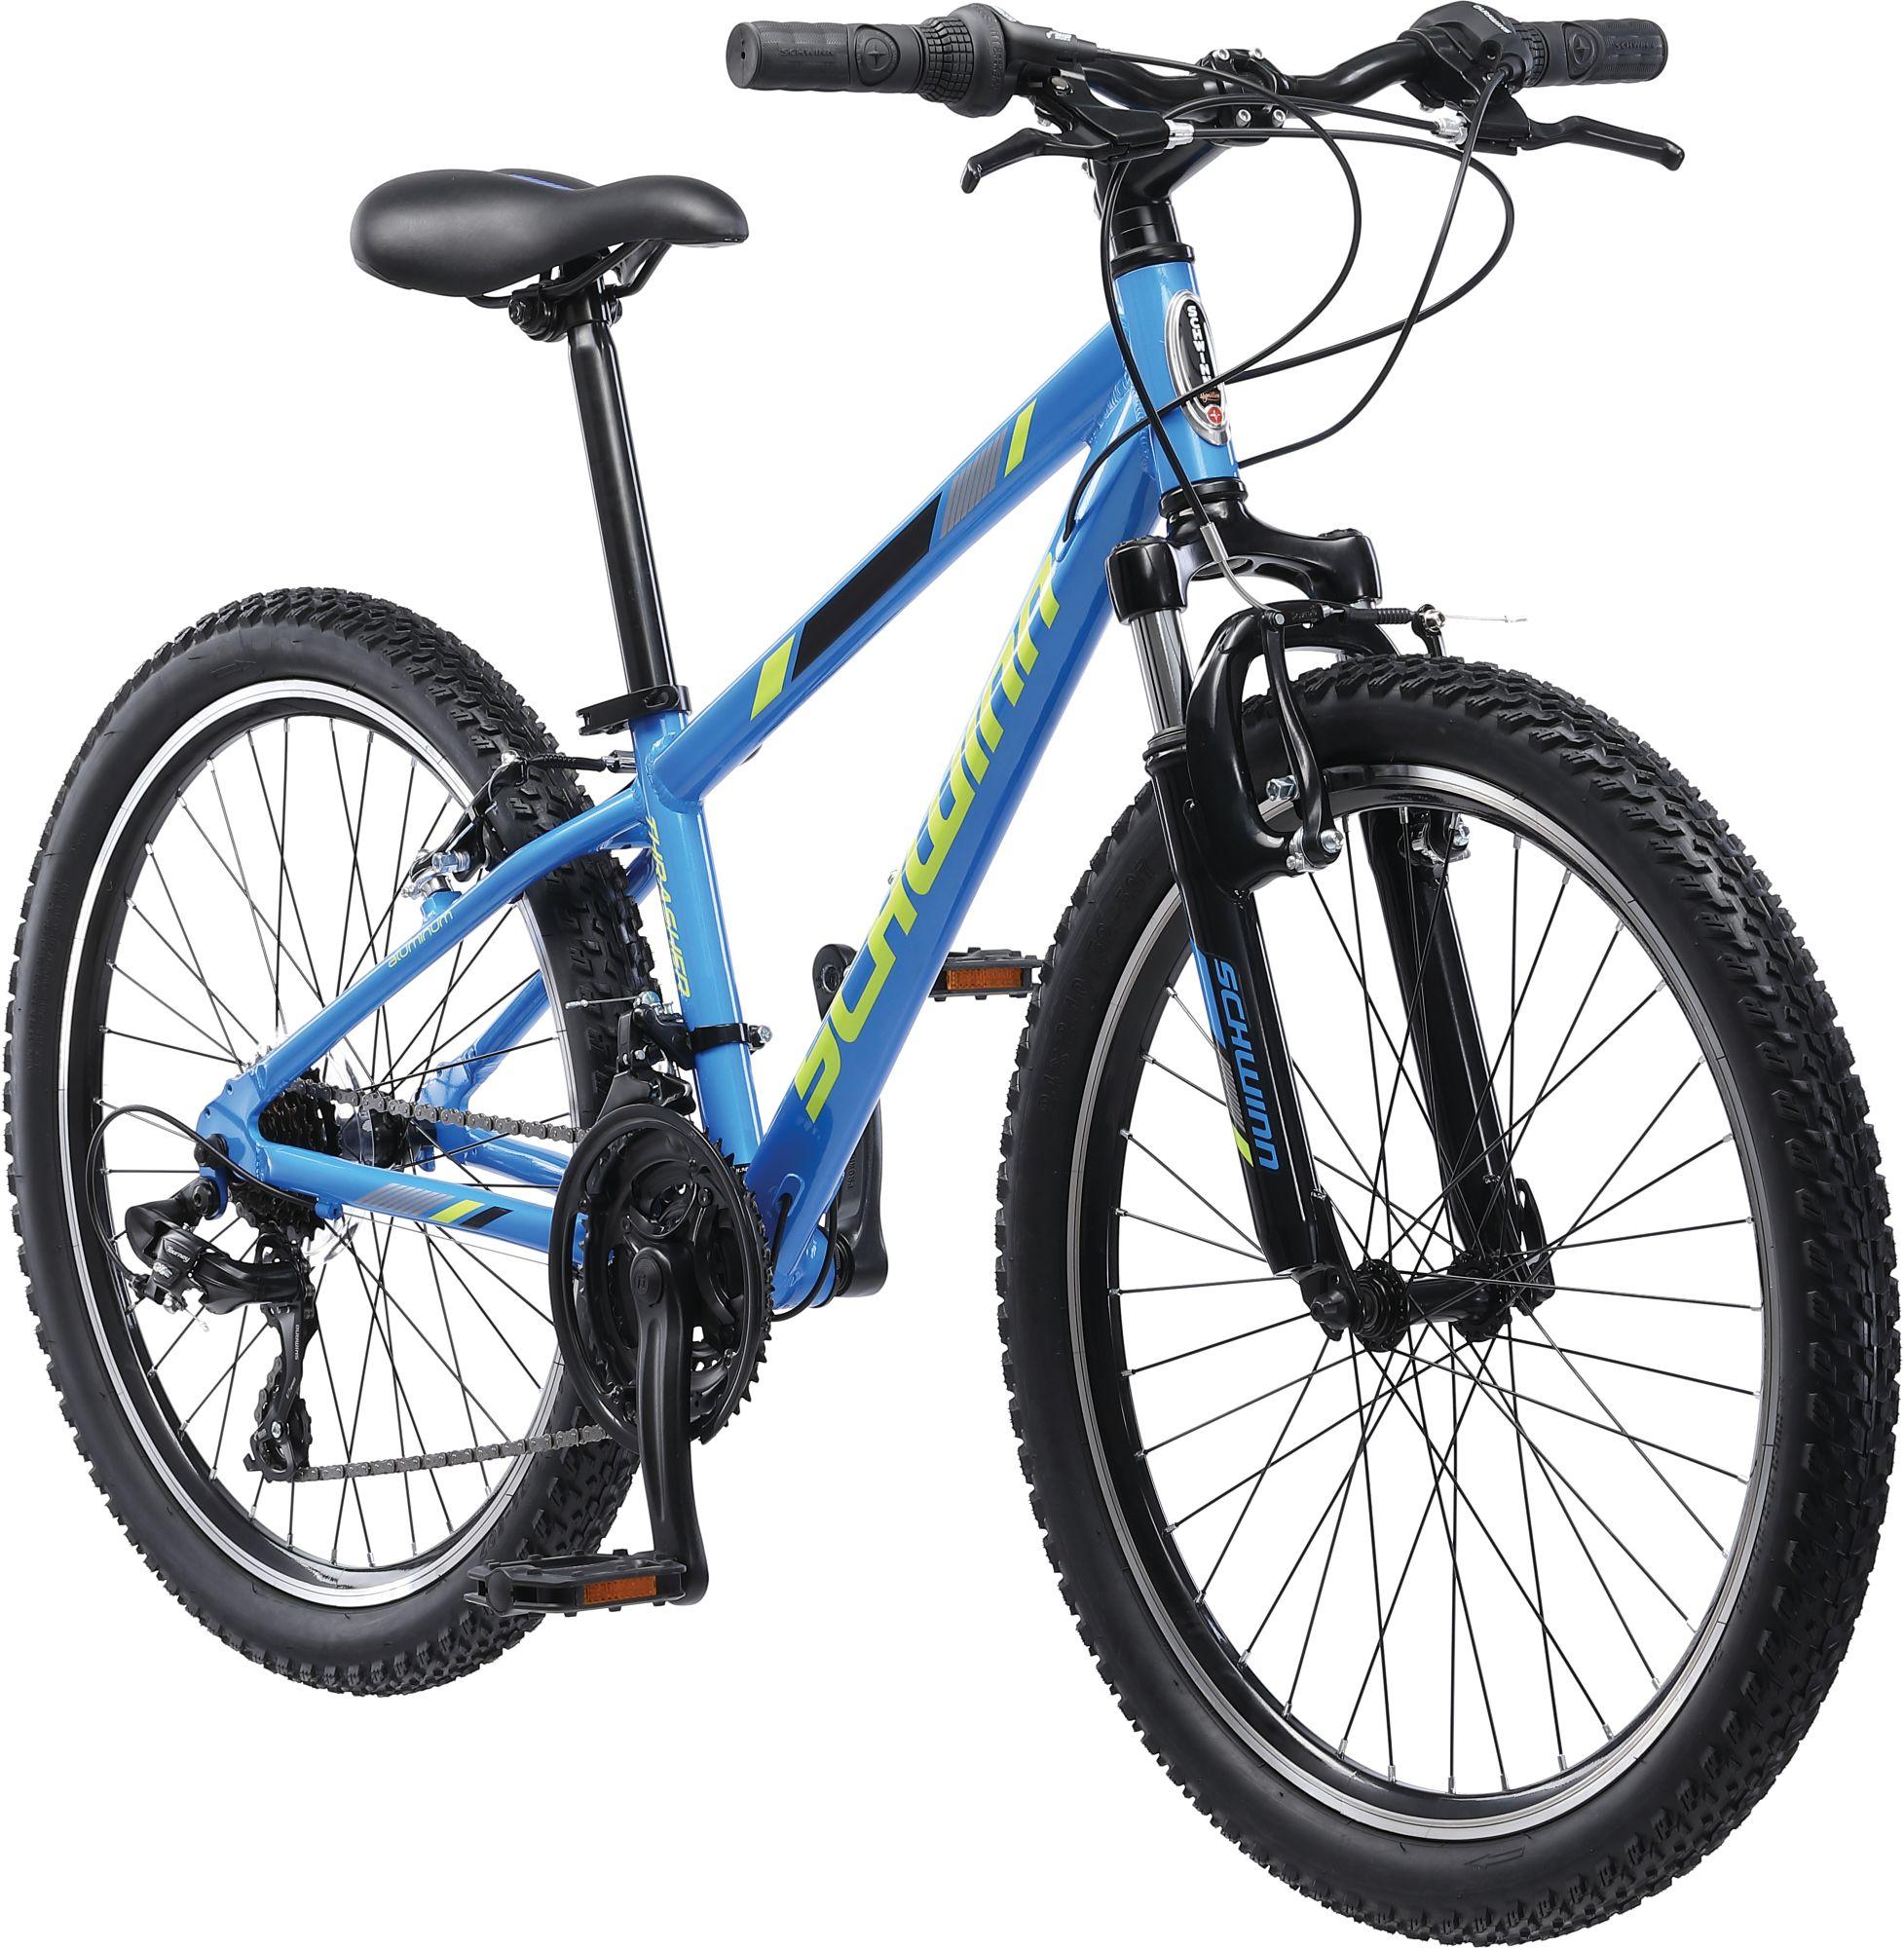 Schwinn cykel dating